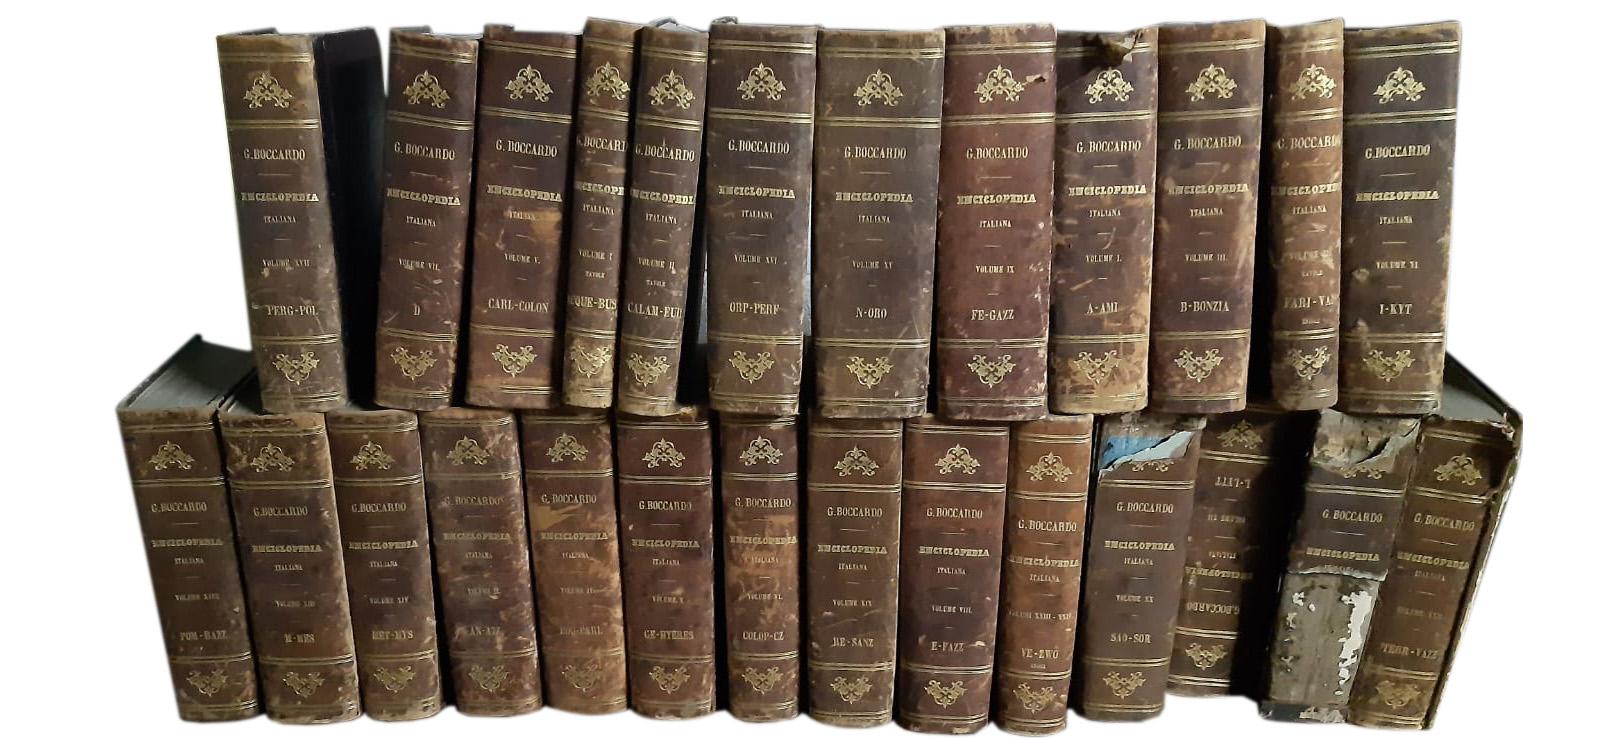 Enciclopedia italiana Boccardo – UTET